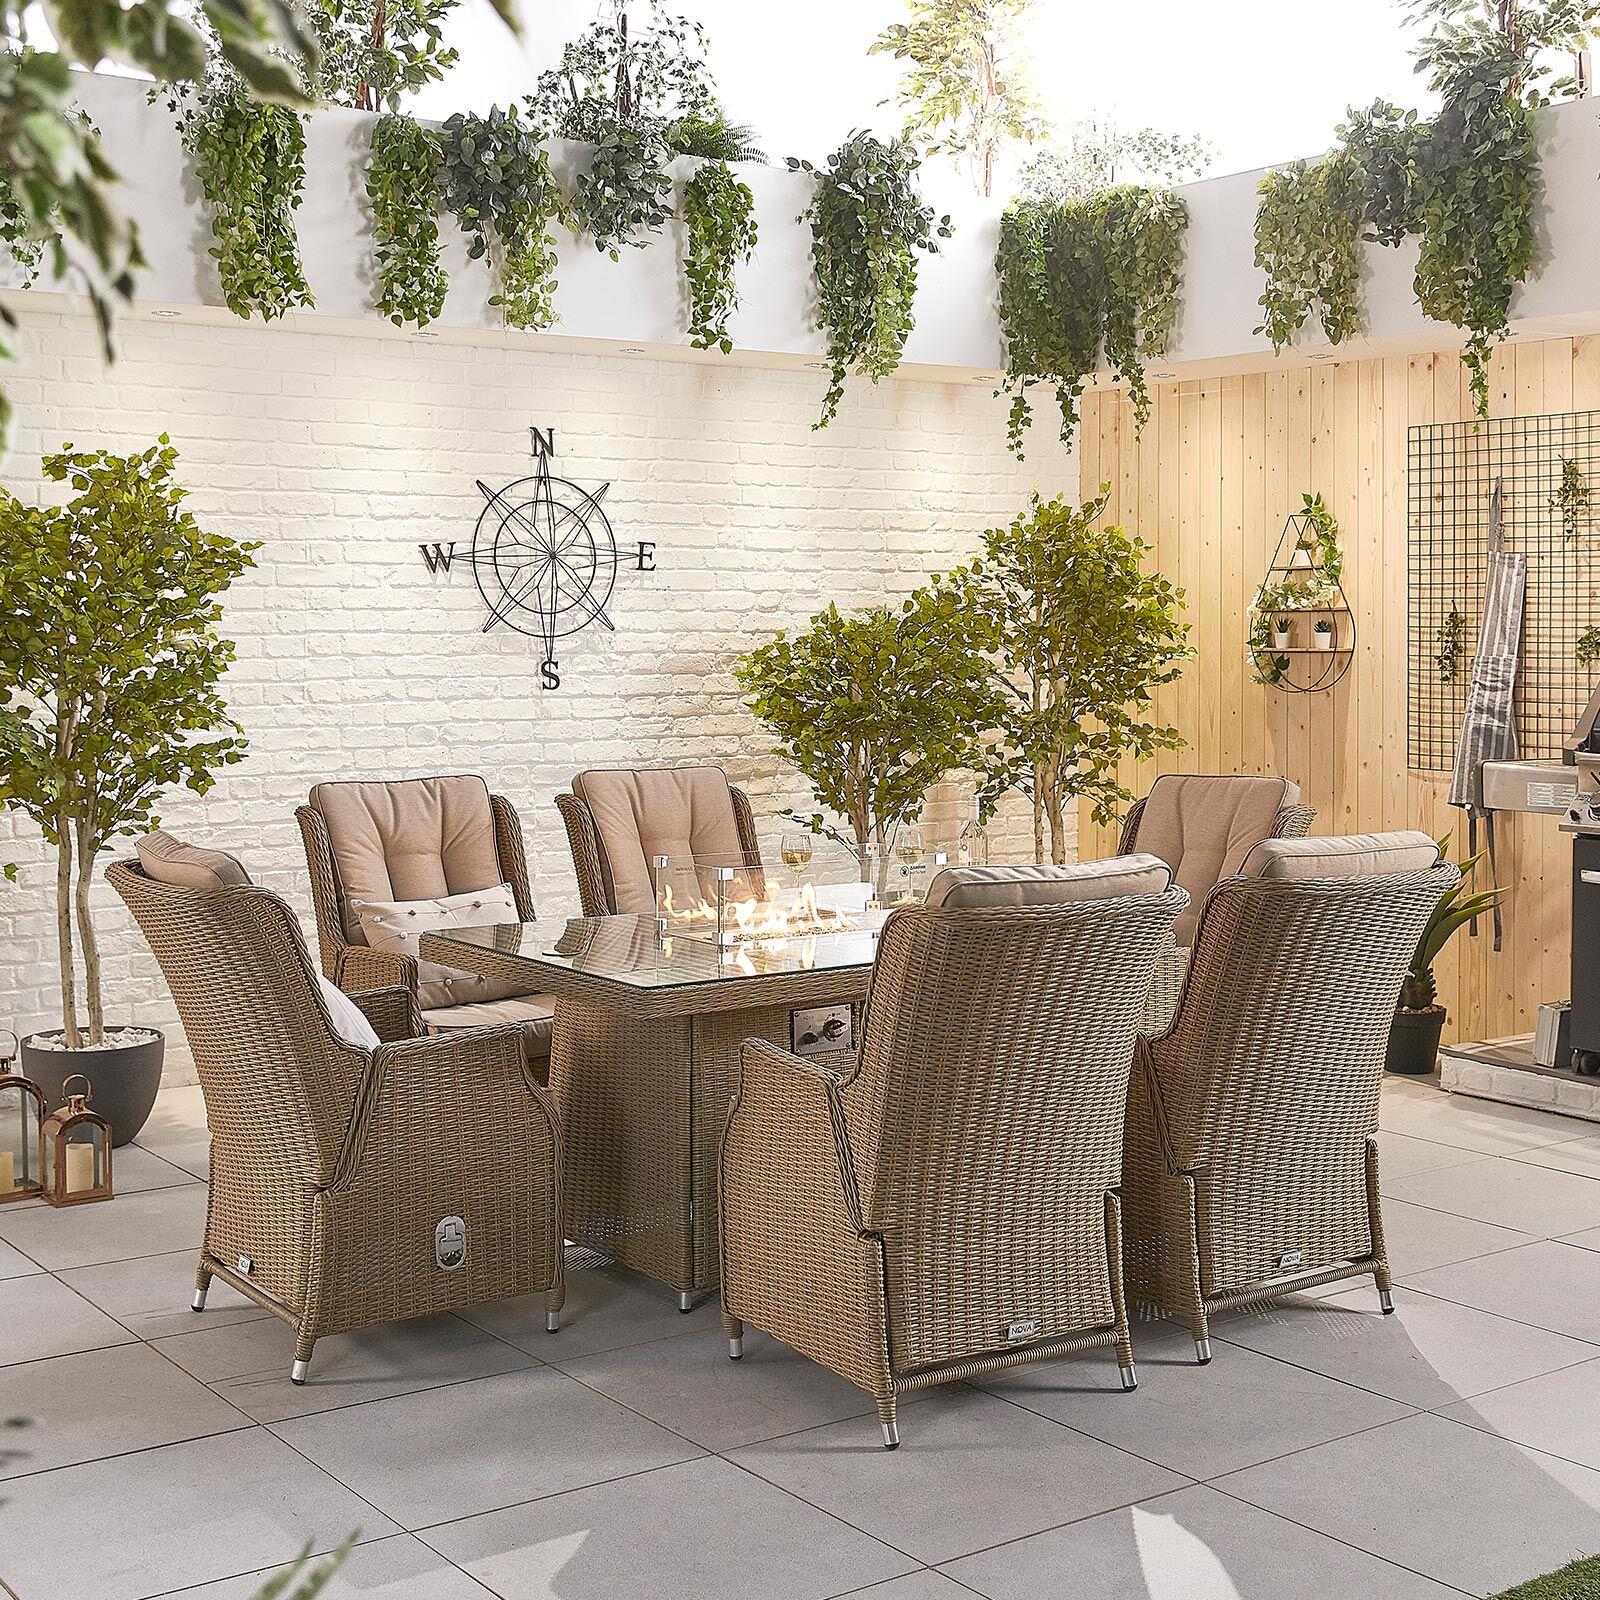 Oakworld Alfresco Heritage Carolina 6 Seat Dining Set with Fire Pit   1.5m x 1m Rectangular Table   Willow